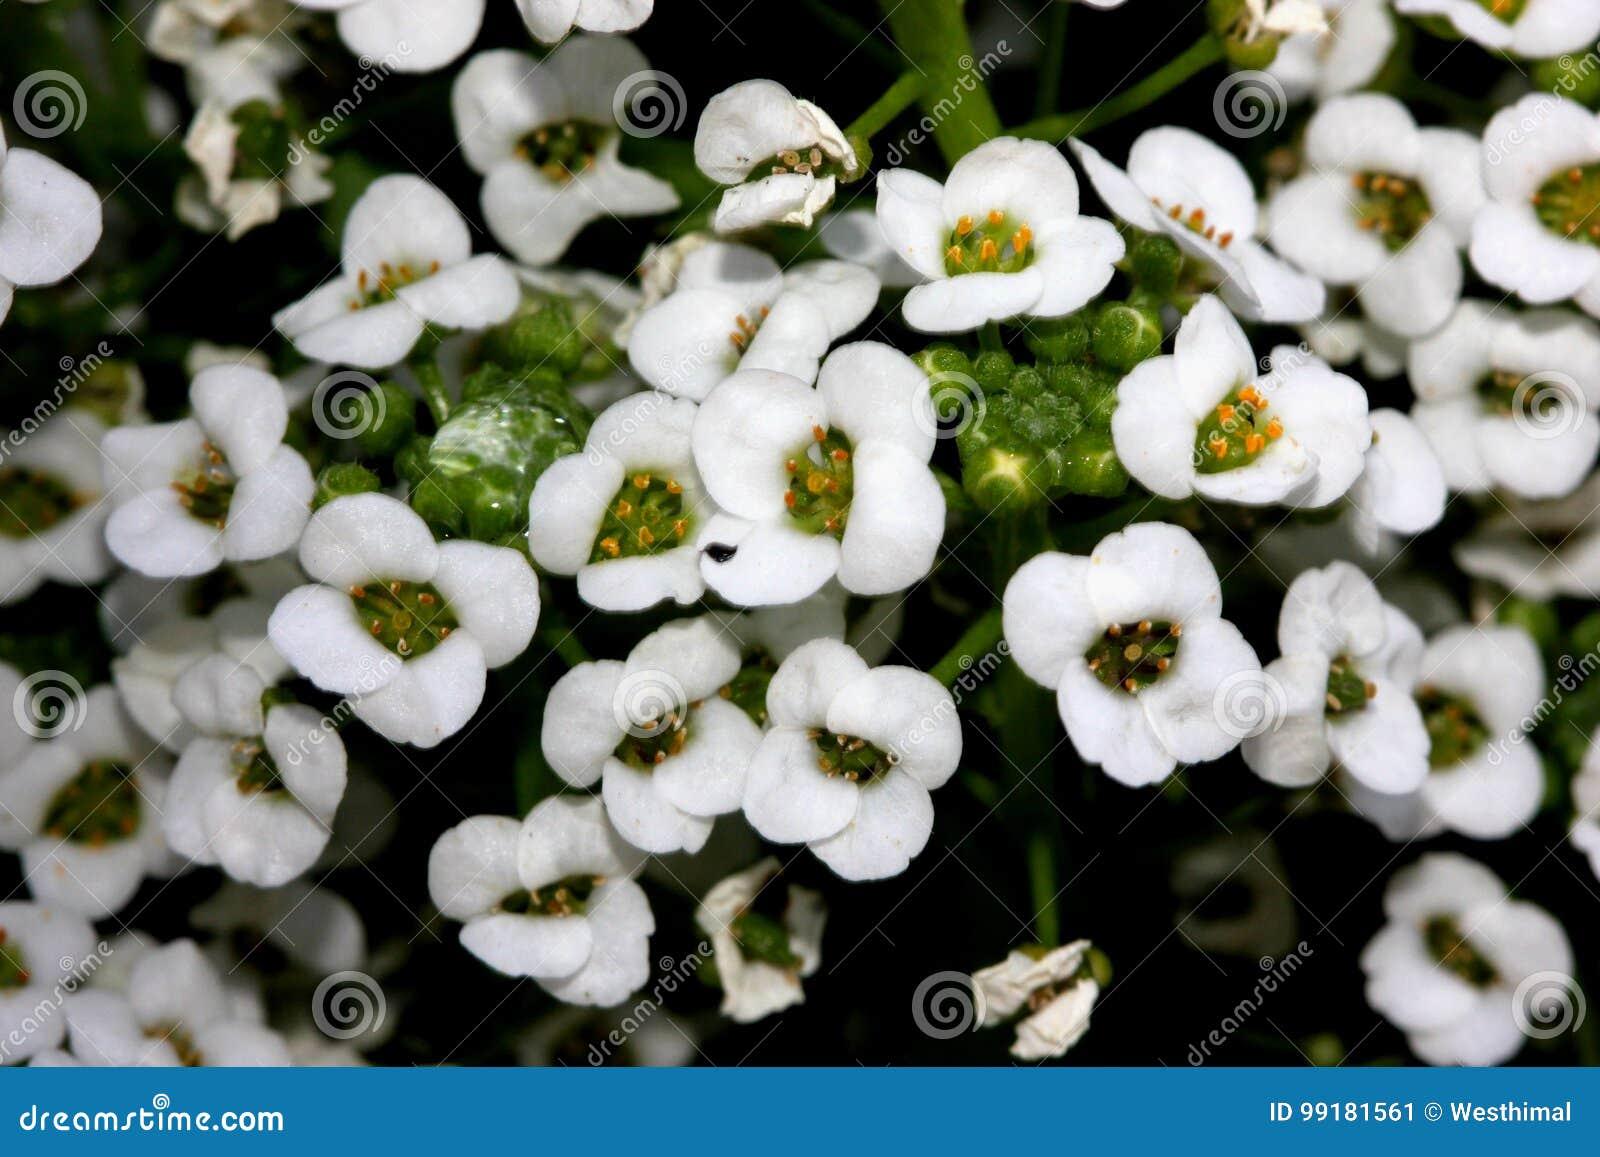 Lobularia maritima sweet alyssum sweet alison stock image image lobularia maritima sweet alyssum sweet alison stock image image of alyssum small 99181561 izmirmasajfo